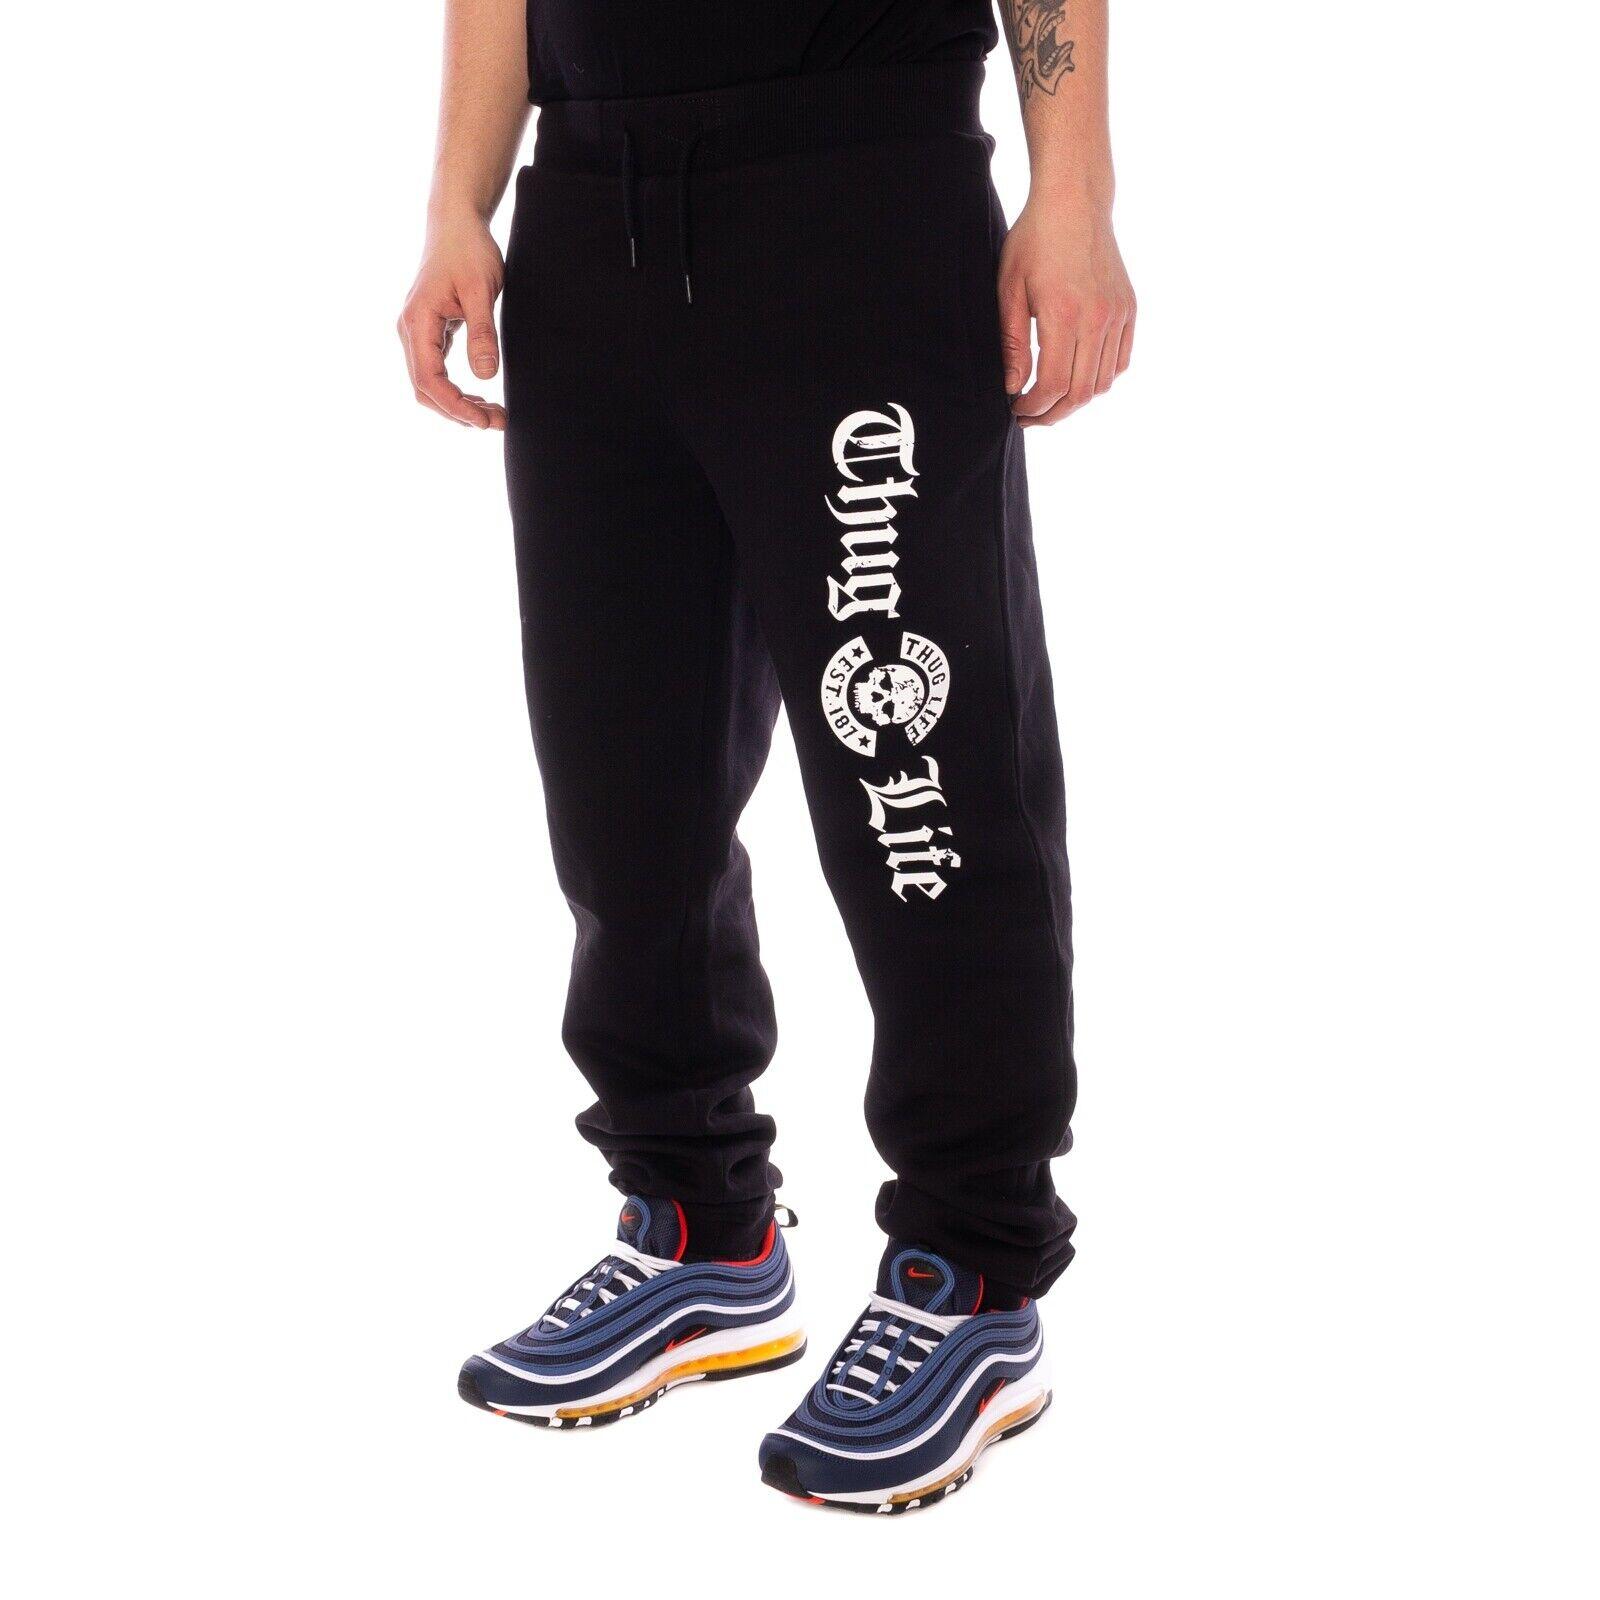 Thug Life Old English Pantaloni Pantaloni Sport Nero 15764